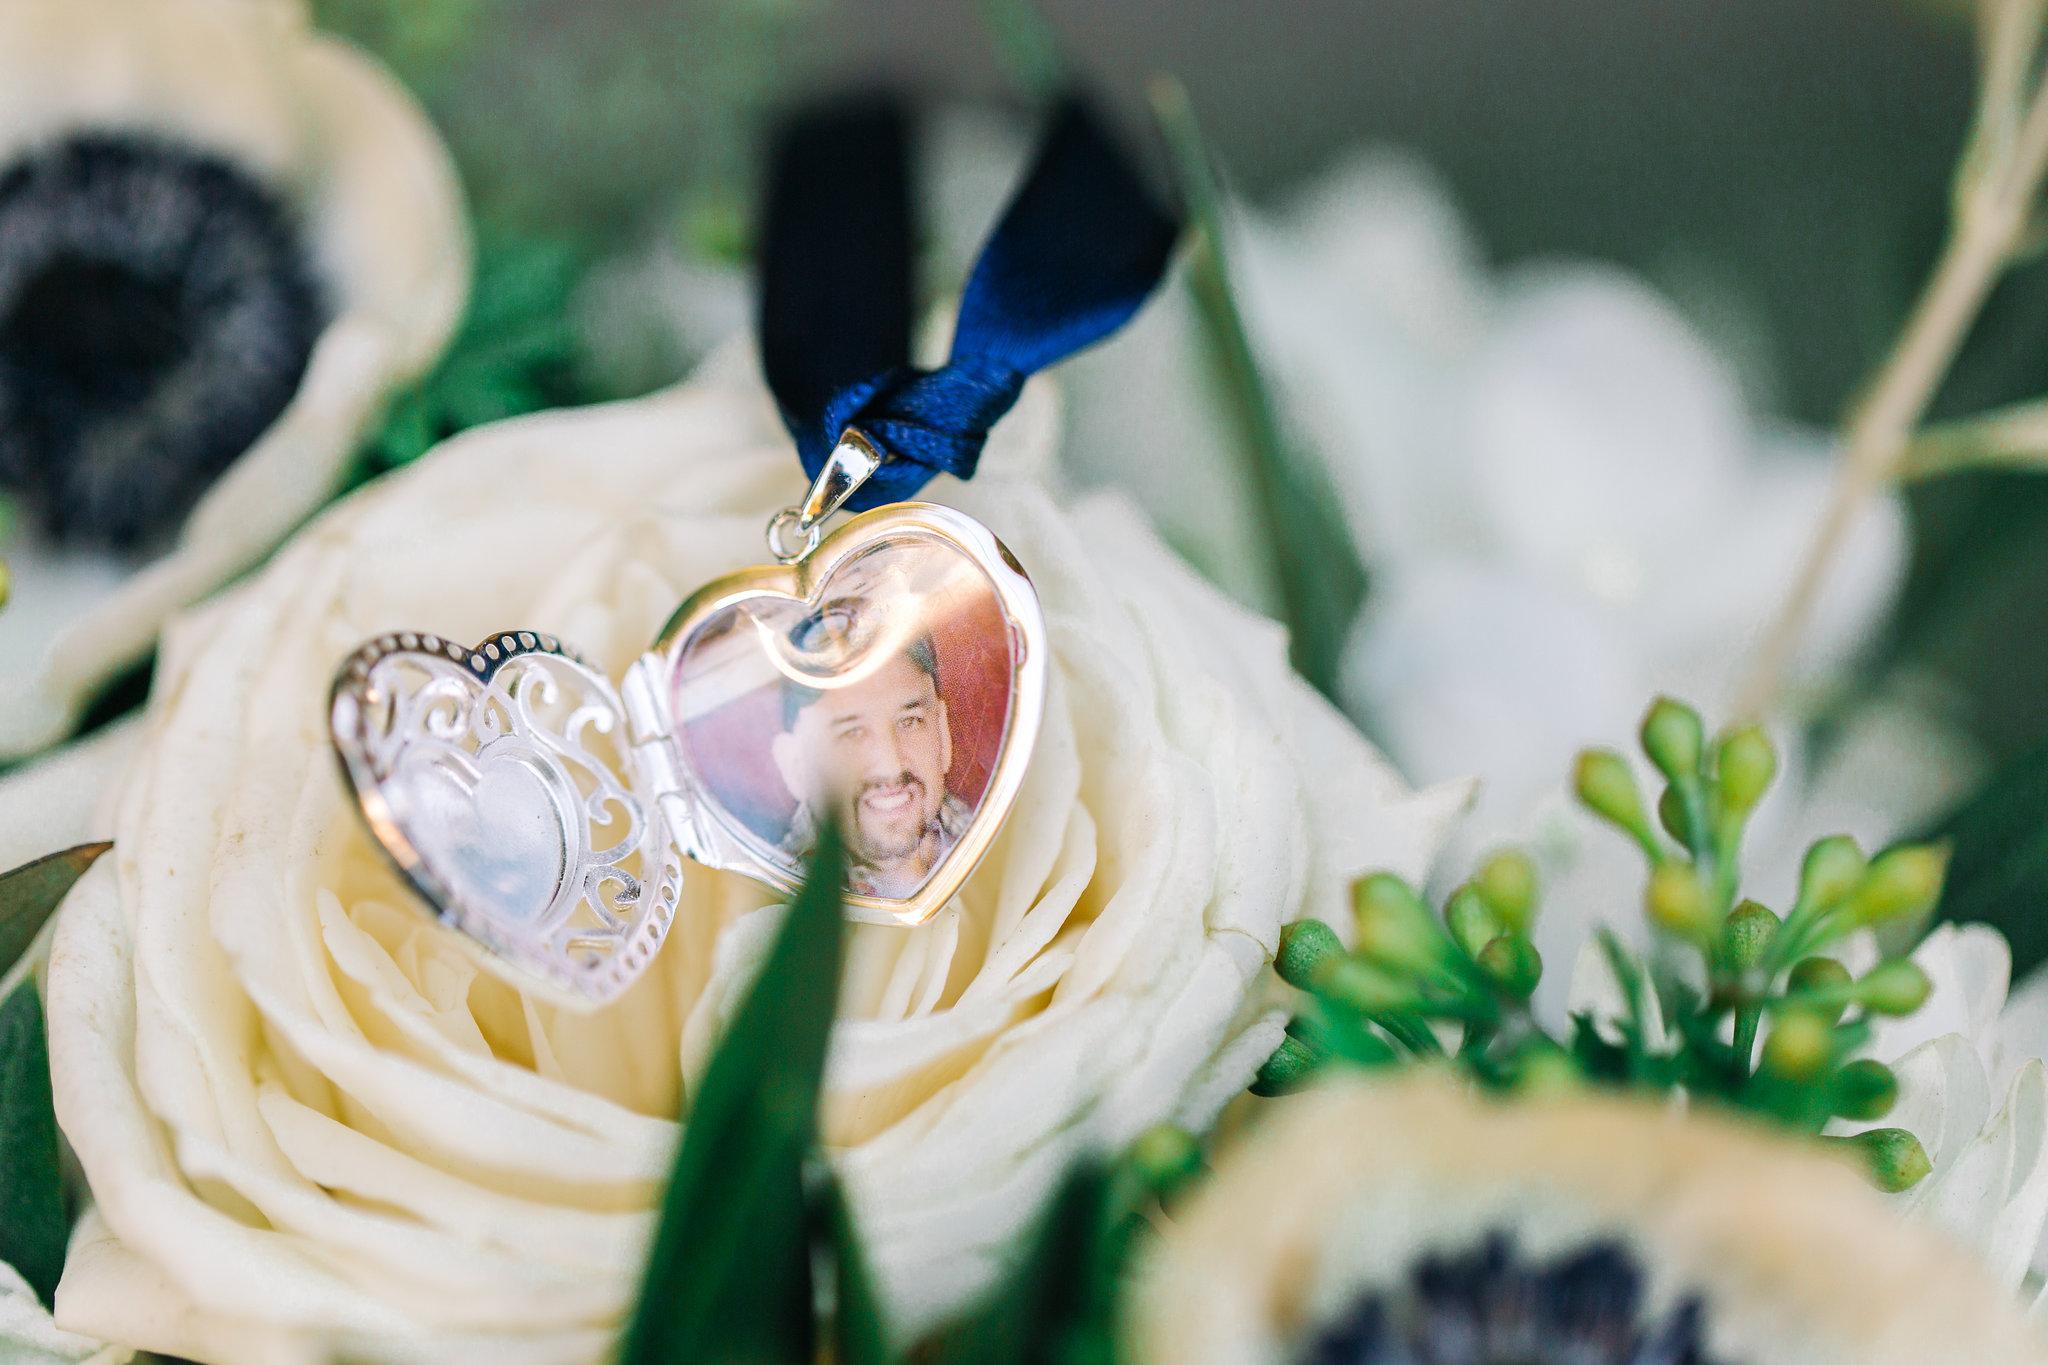 San Clemente, San clemente beach wedding, the casino san clemente, bridal bouquet anemone, memory gift, bride locket